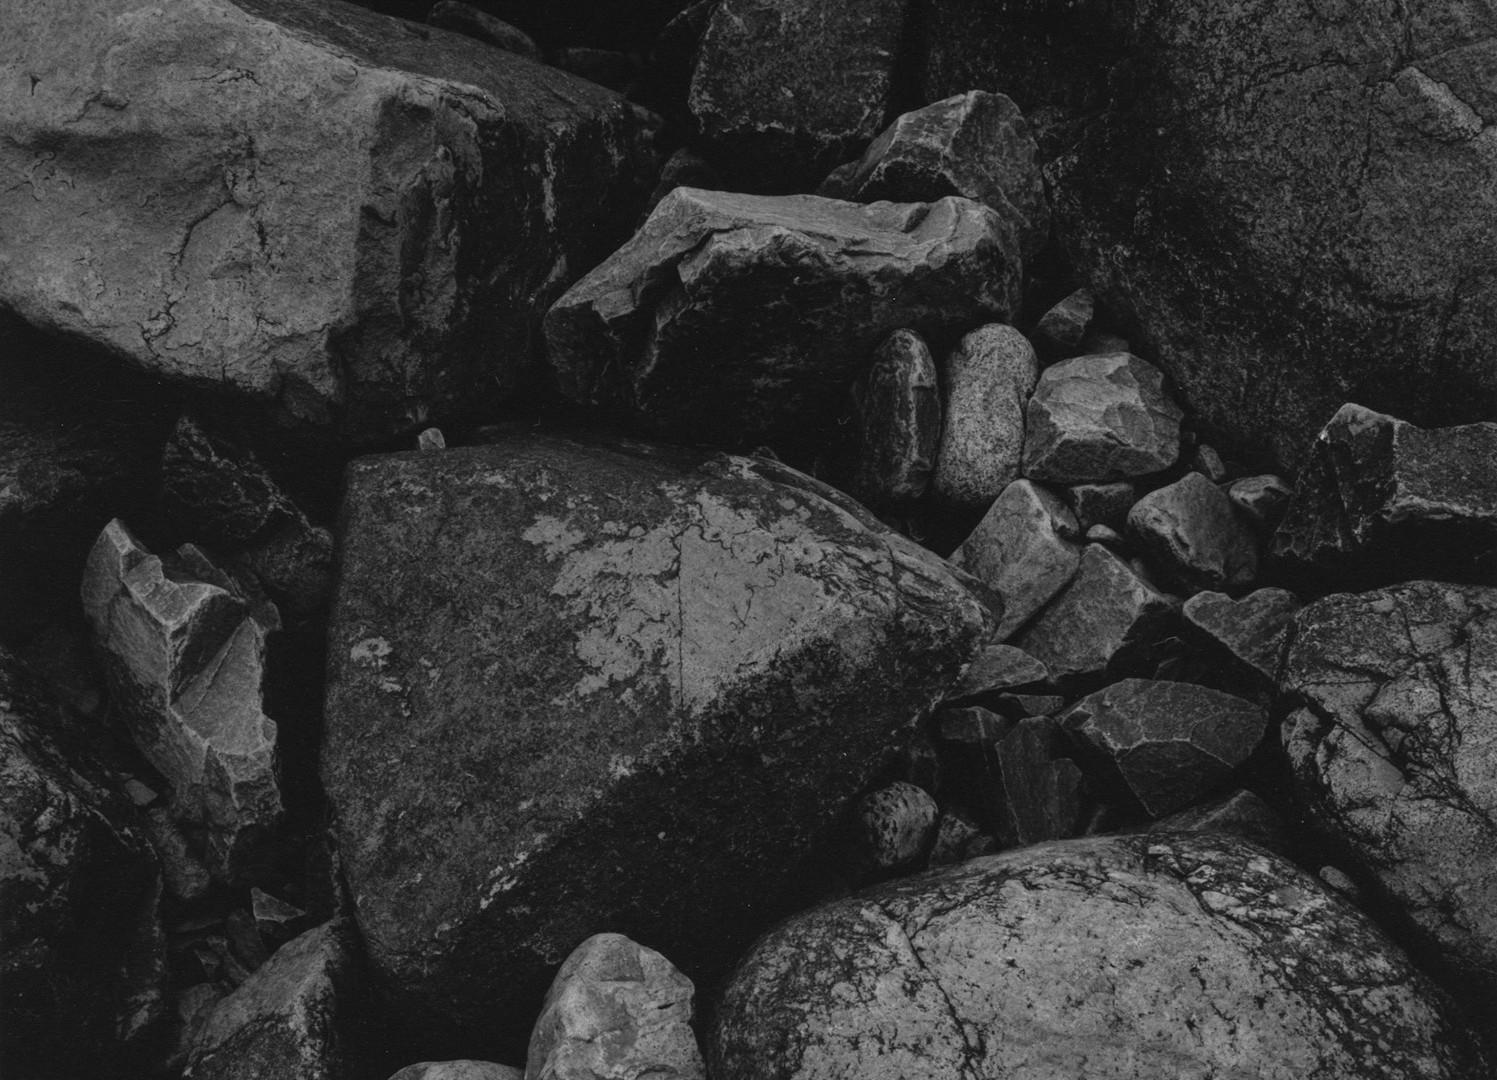 Harry Callahan, Bass Rocks, 1963